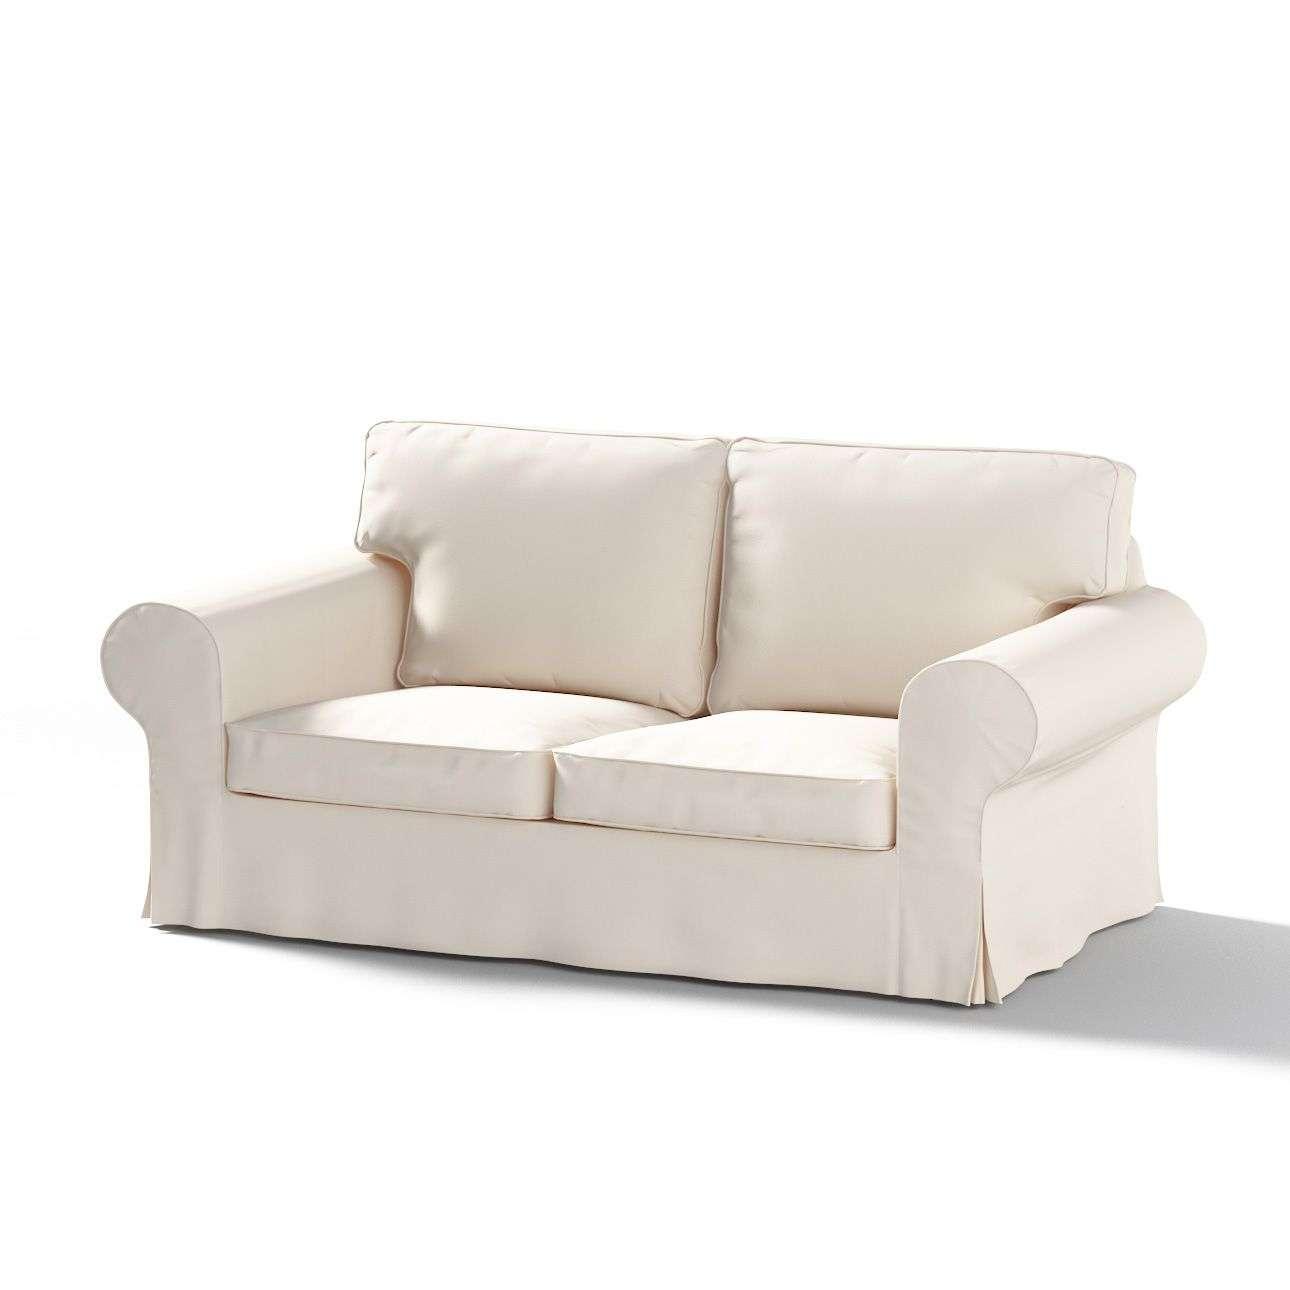 ektorp bezug f r das sofa den sessel den hocker im. Black Bedroom Furniture Sets. Home Design Ideas